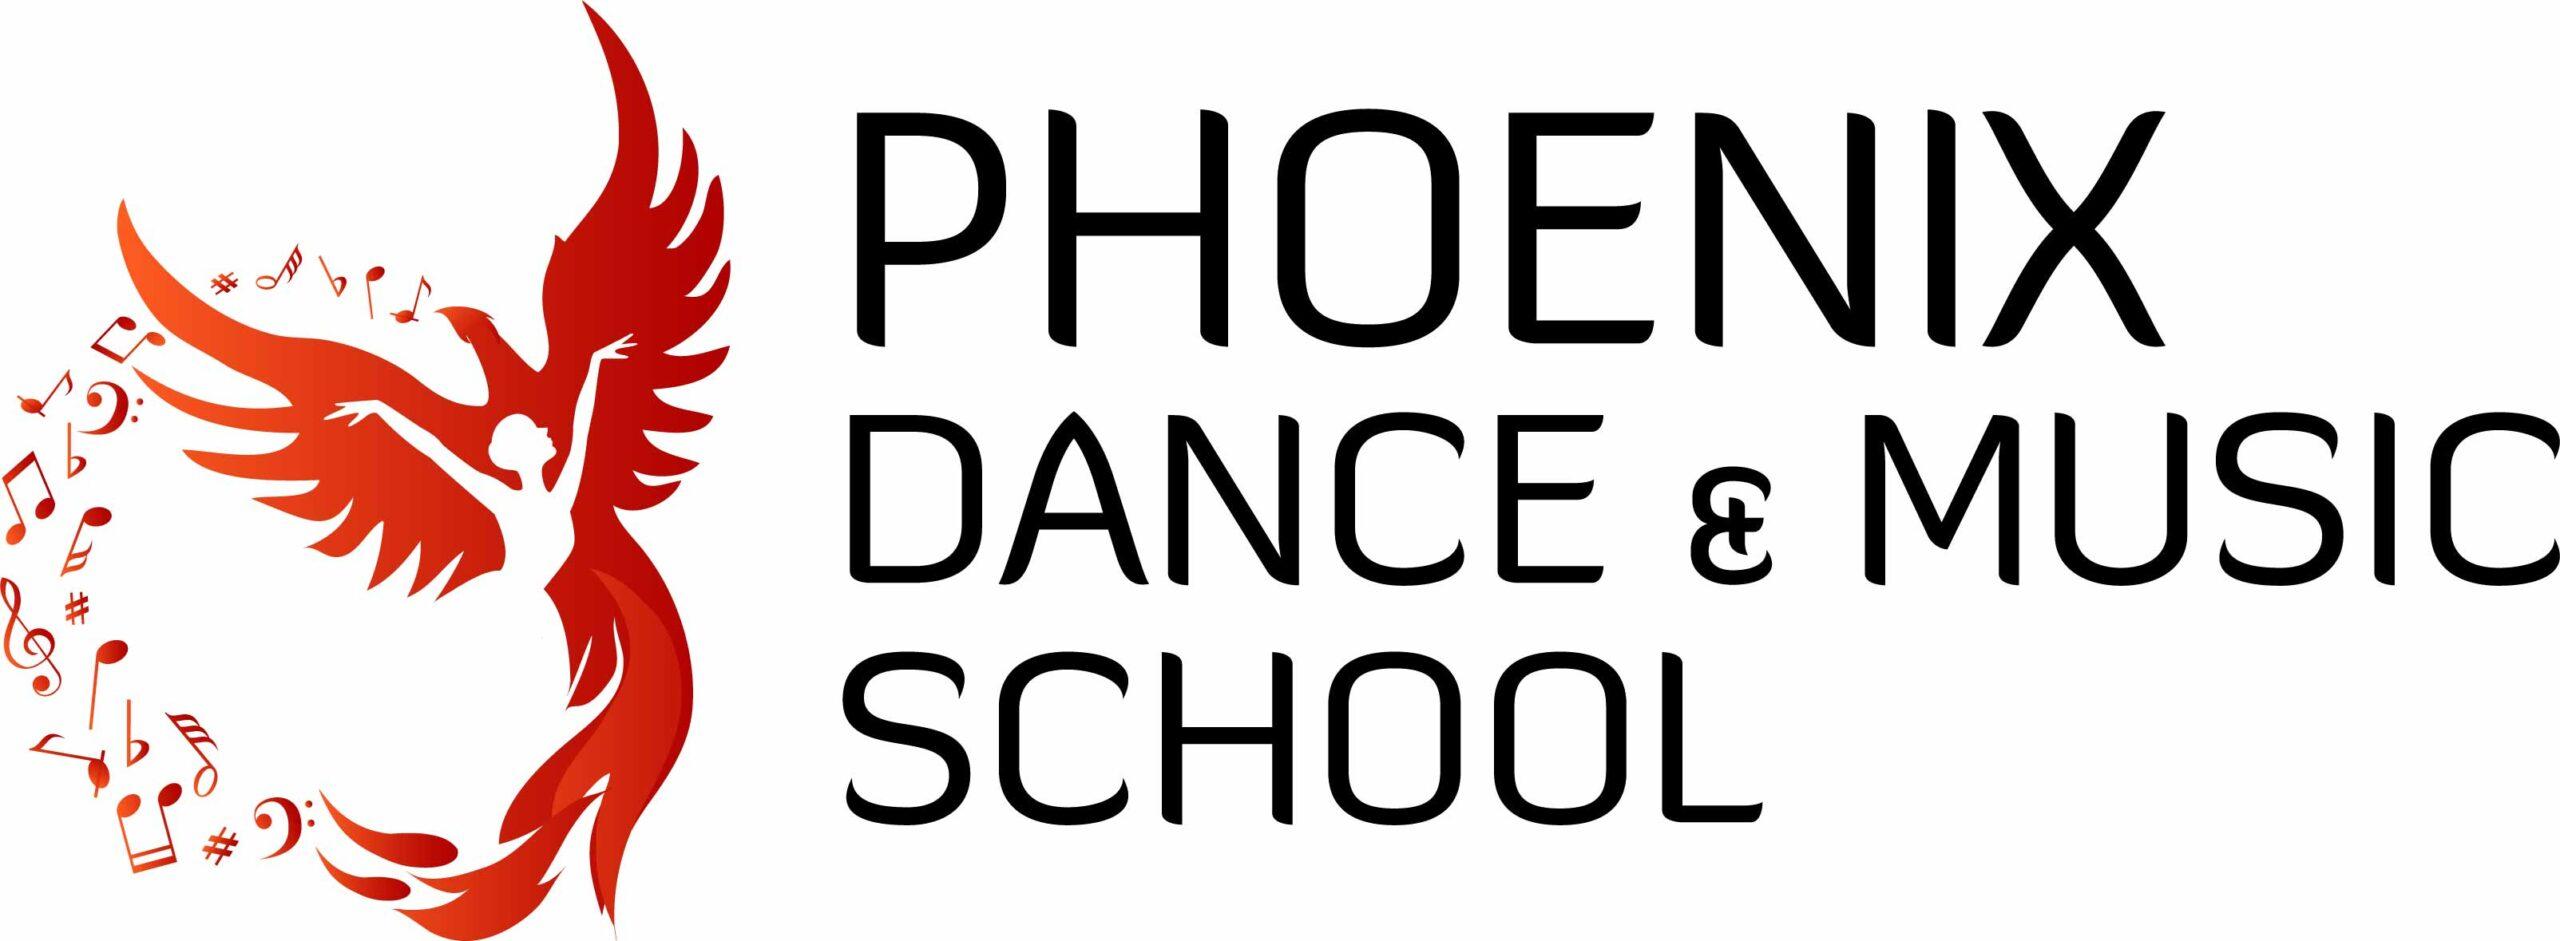 Phoenix Dance & Music School